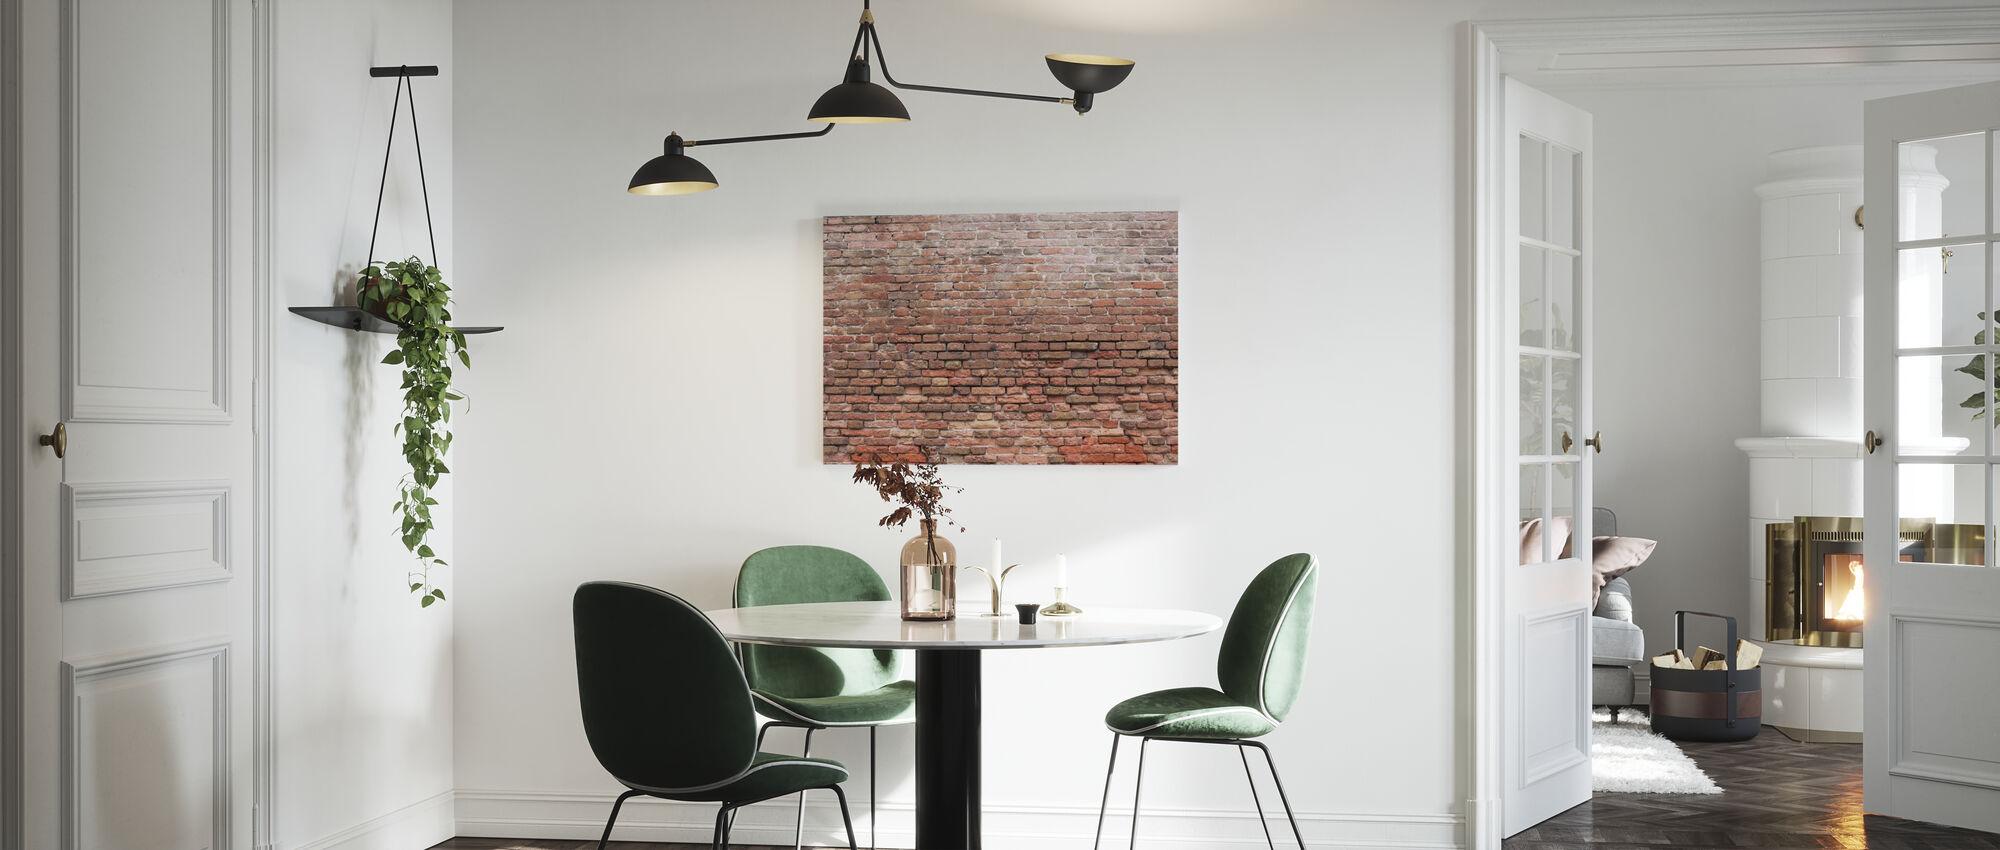 Dilapidated Brick Wall - Canvas print - Kitchen